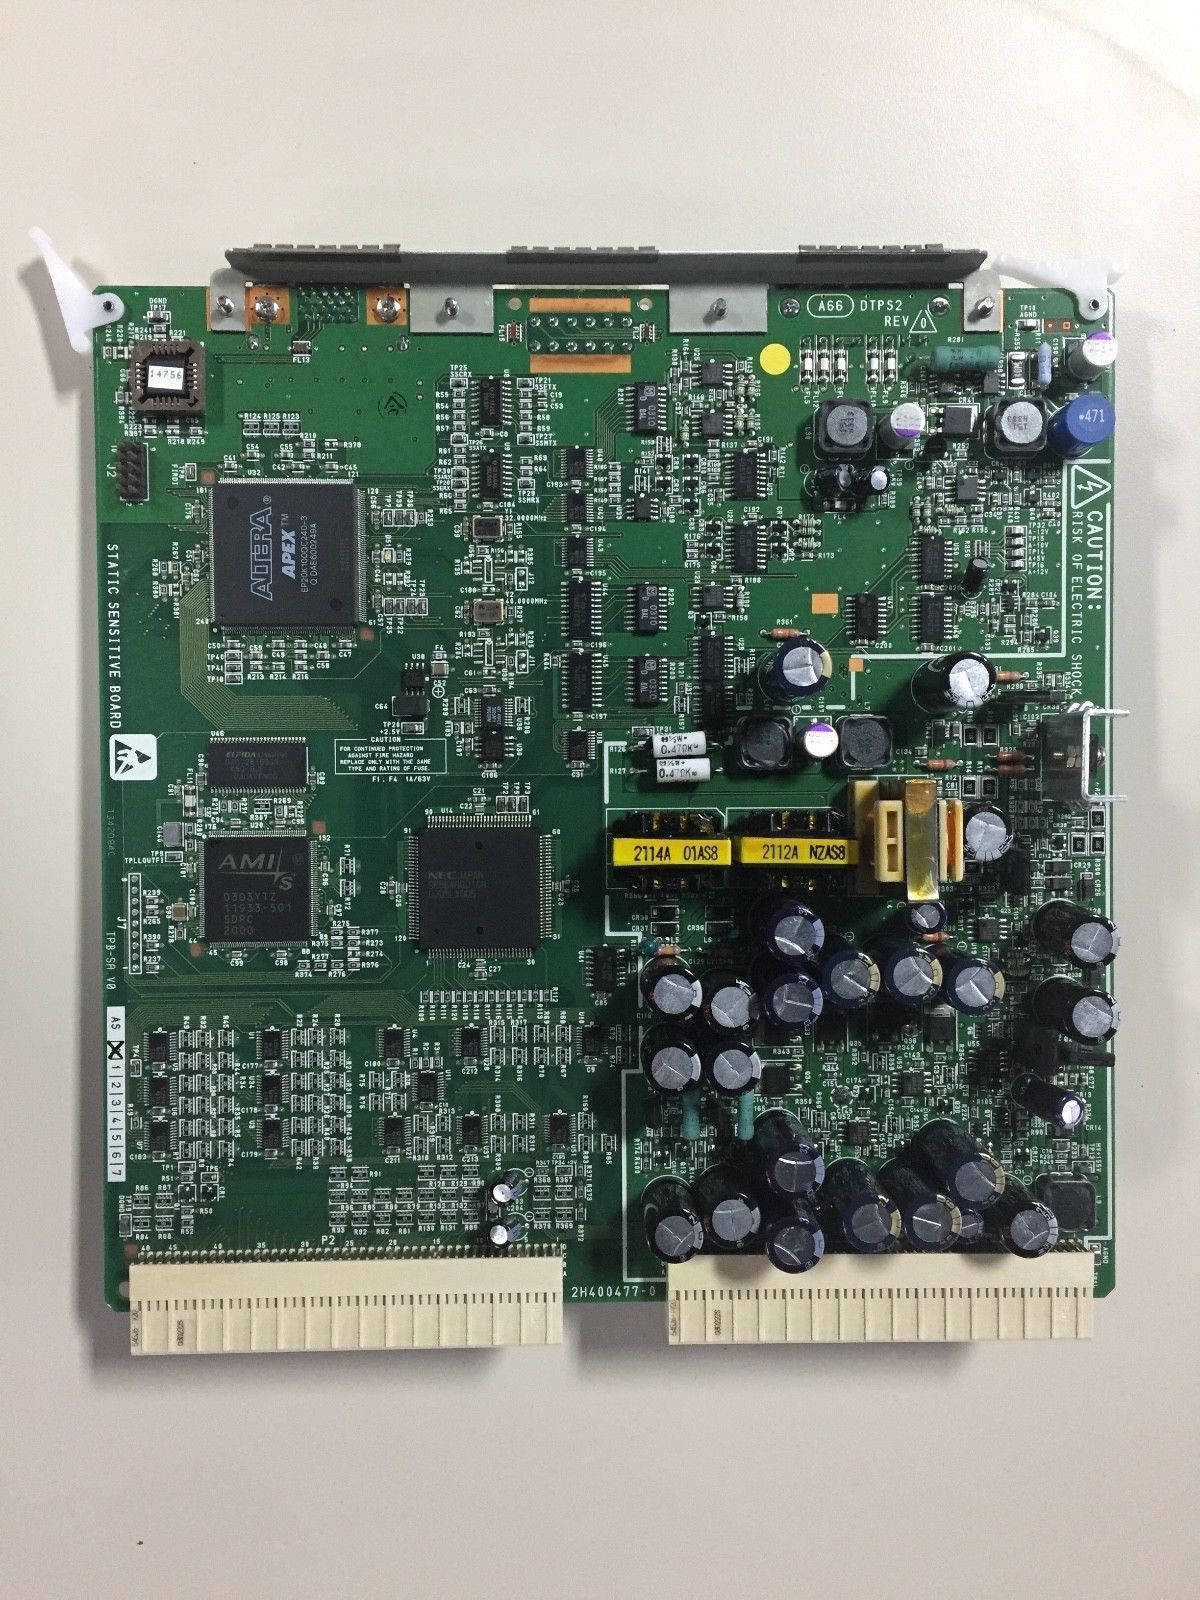 2H400369-1 STRX BOARD - SIEMENS - ACUSON - CV70